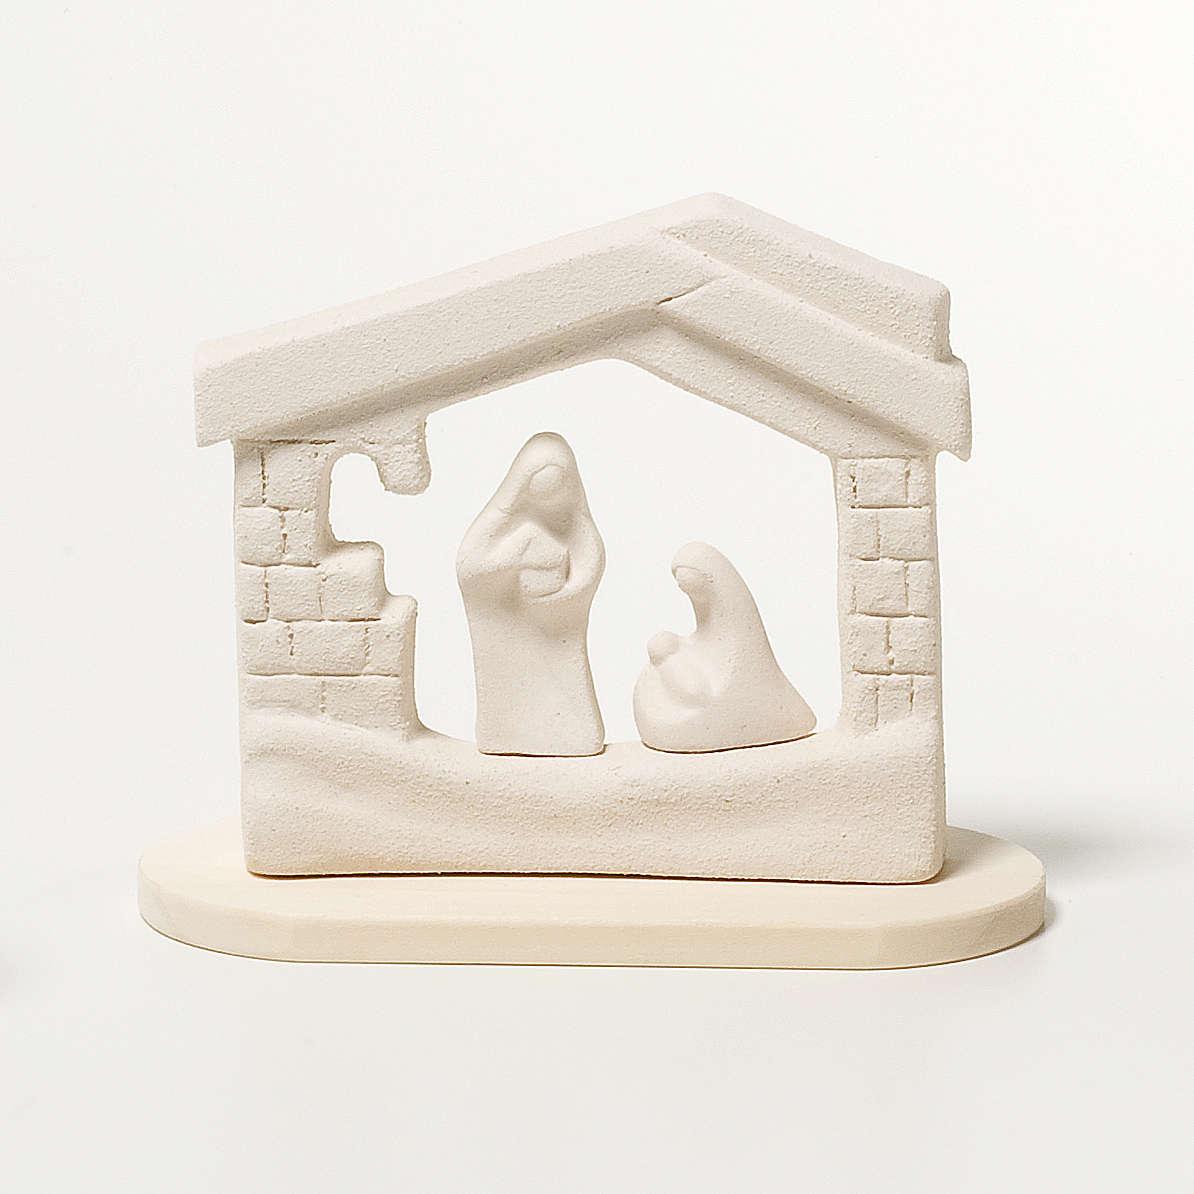 Presepe casetta Natale su base argilla 14,5 cm 4